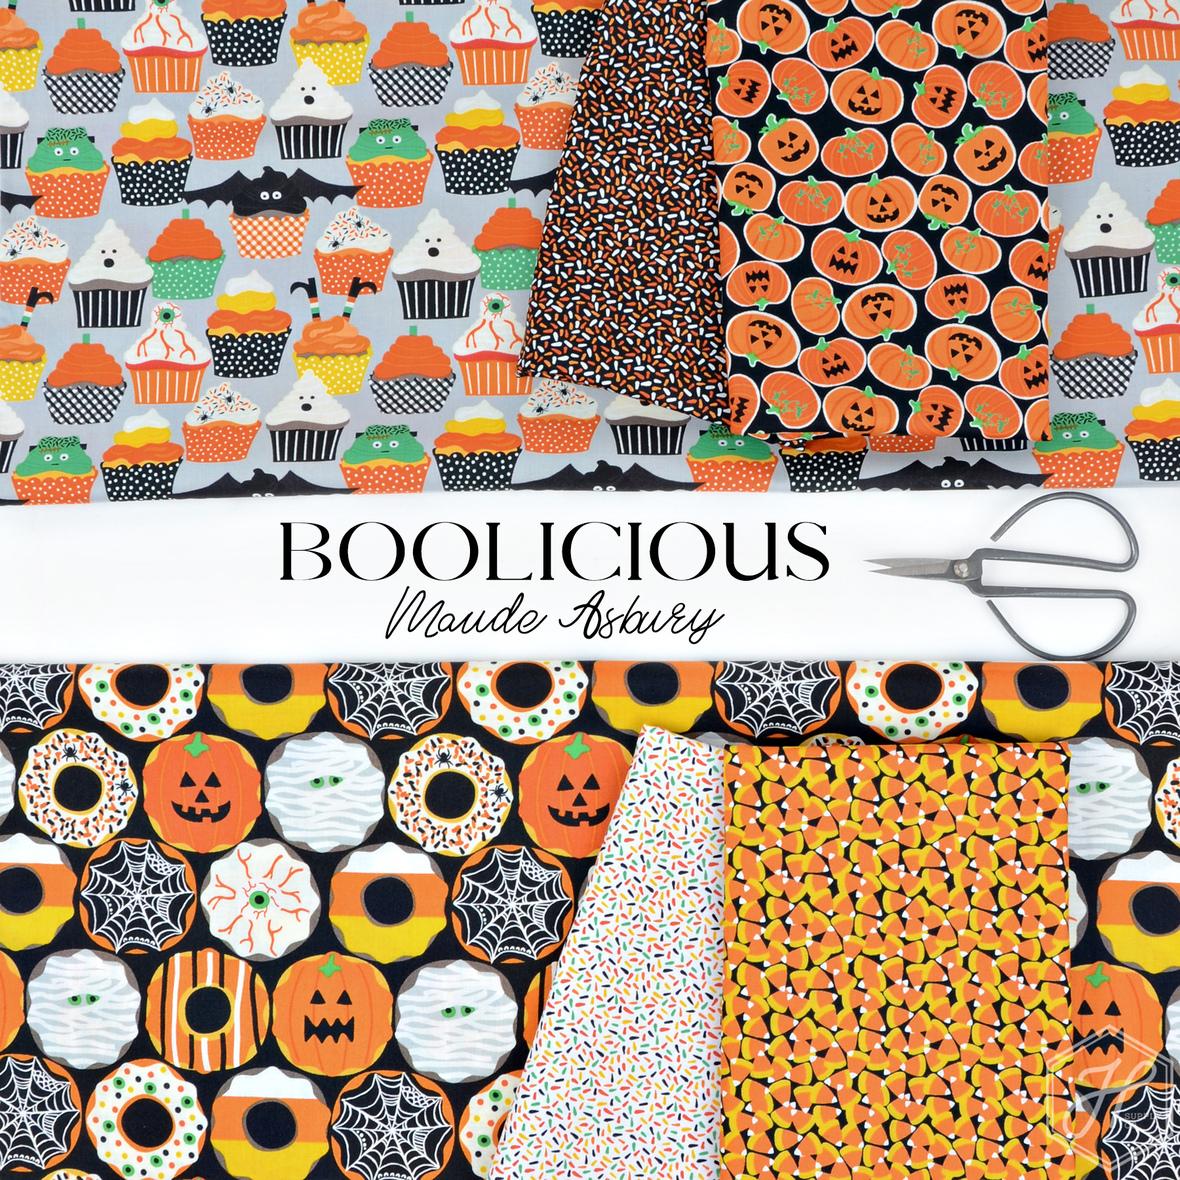 Boolicous by Maude Asbury Free Spirit Fabric at Hawthorne